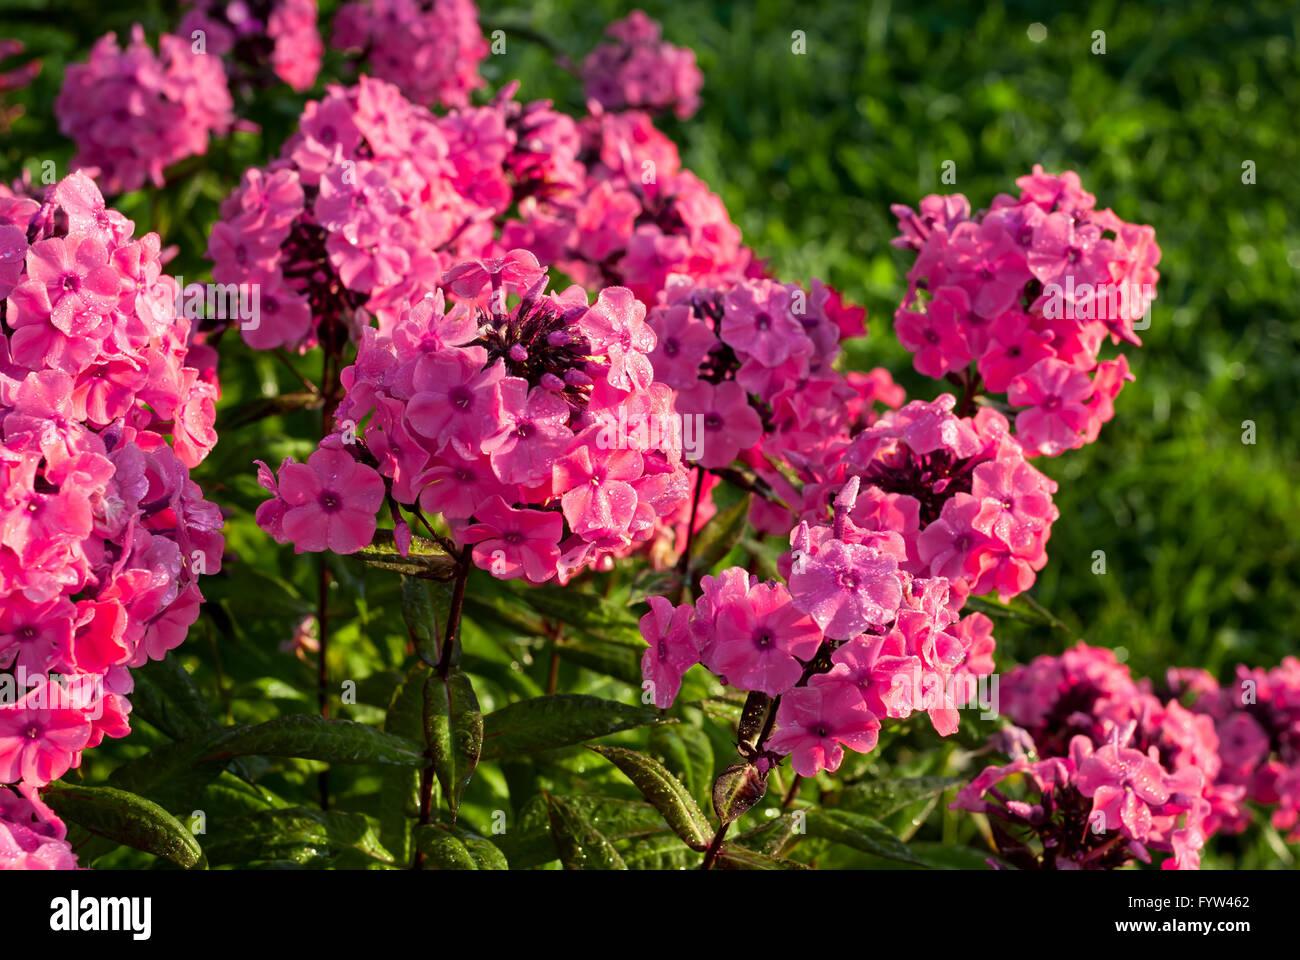 Phlox paniculata fall phlox garden phlox or perennial phlox is a phlox paniculata fall phlox garden phlox or perennial phlox is a species of flowering plant in the family polemoniaceae mightylinksfo